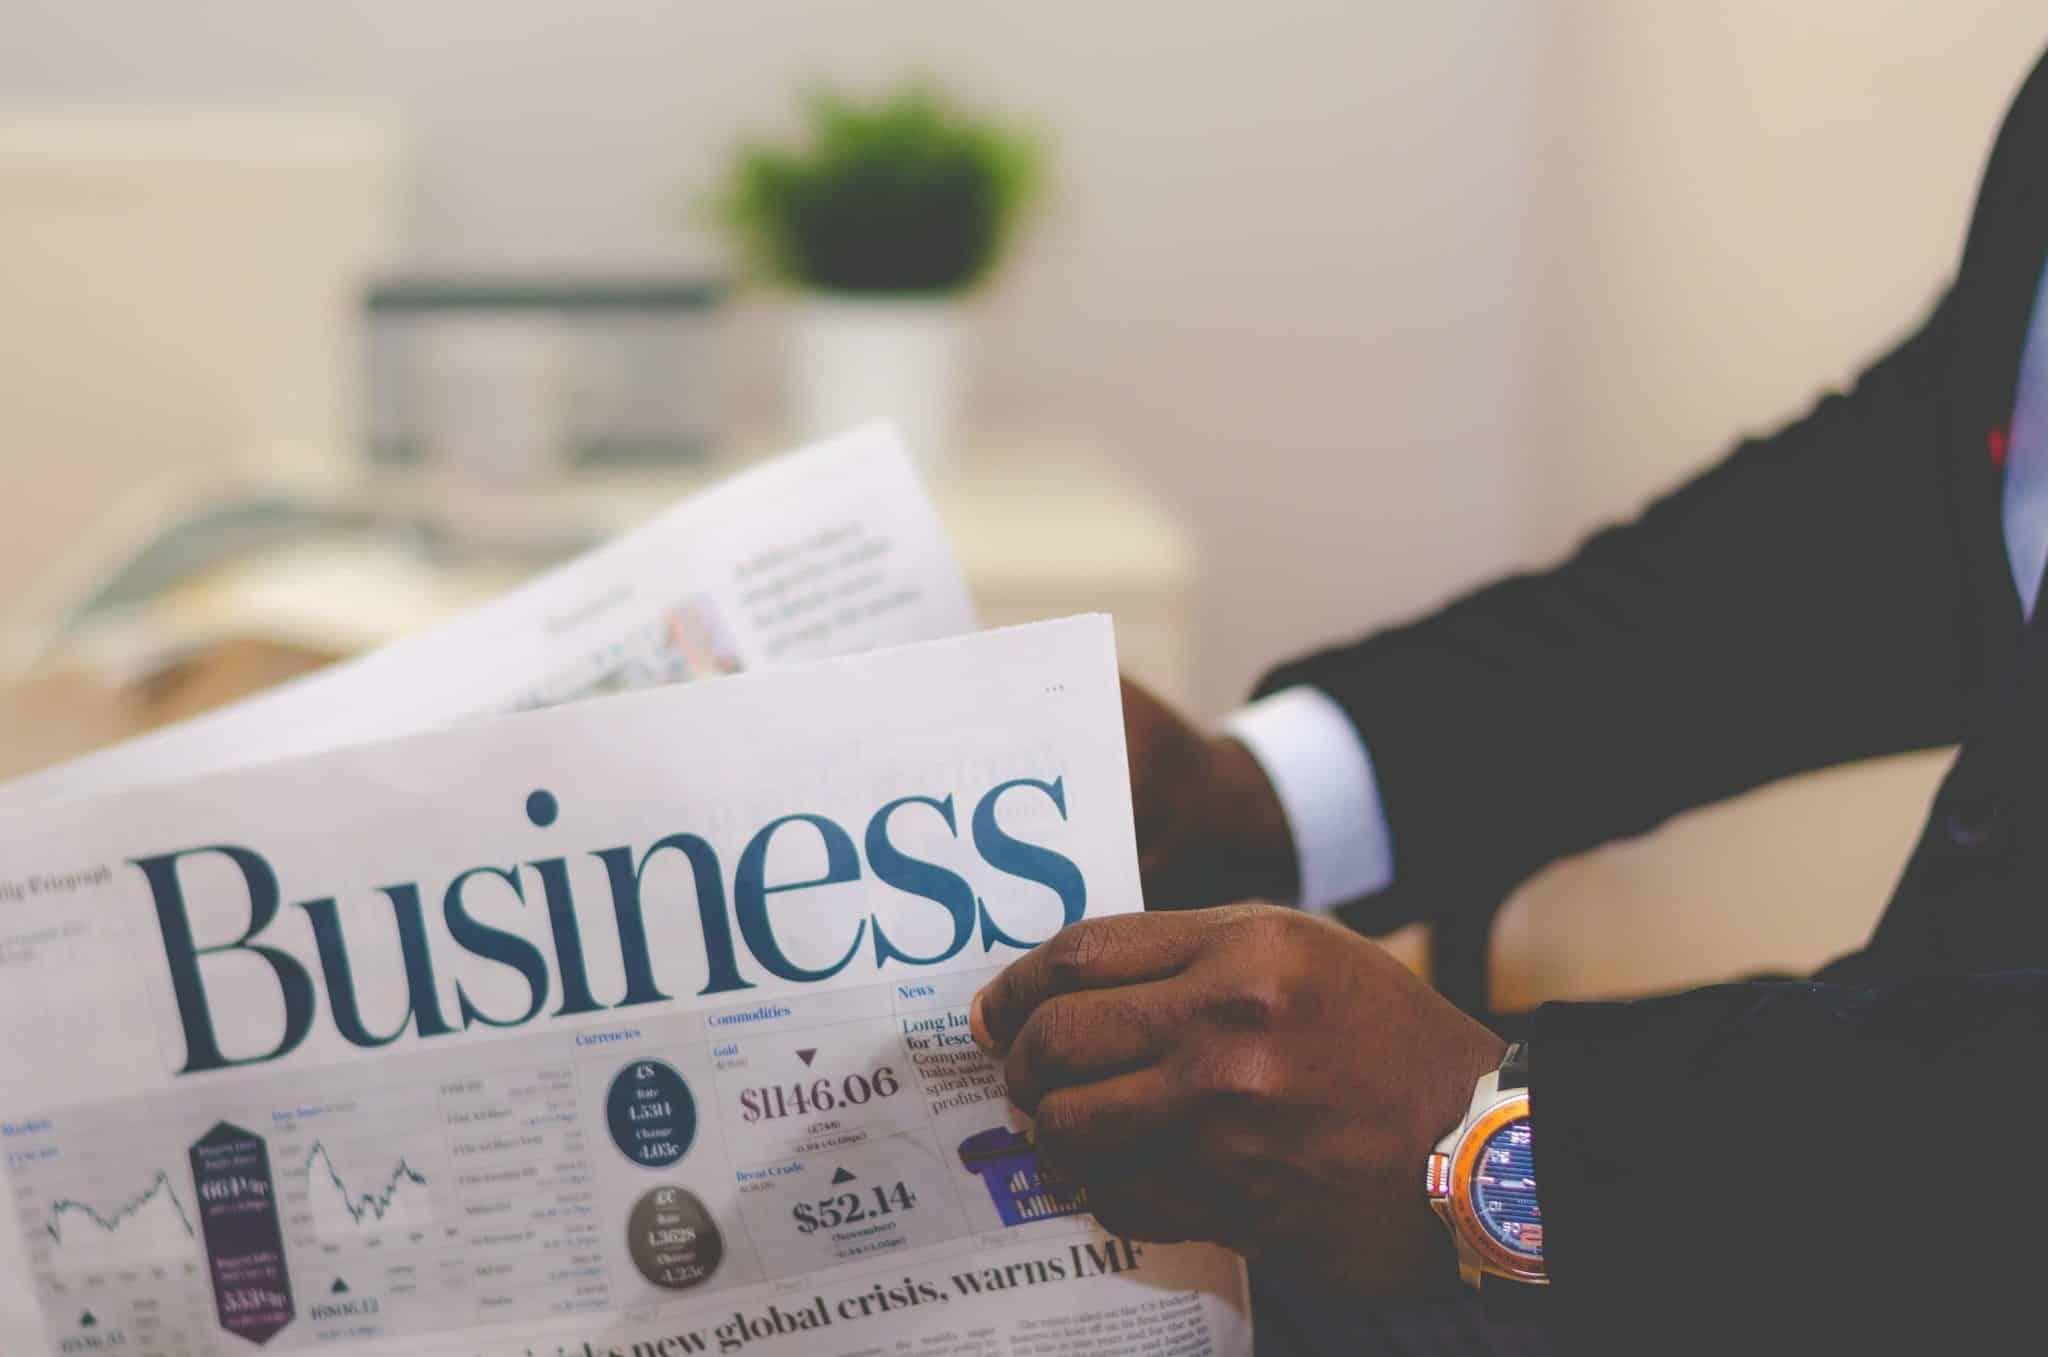 Law Business Management blog image